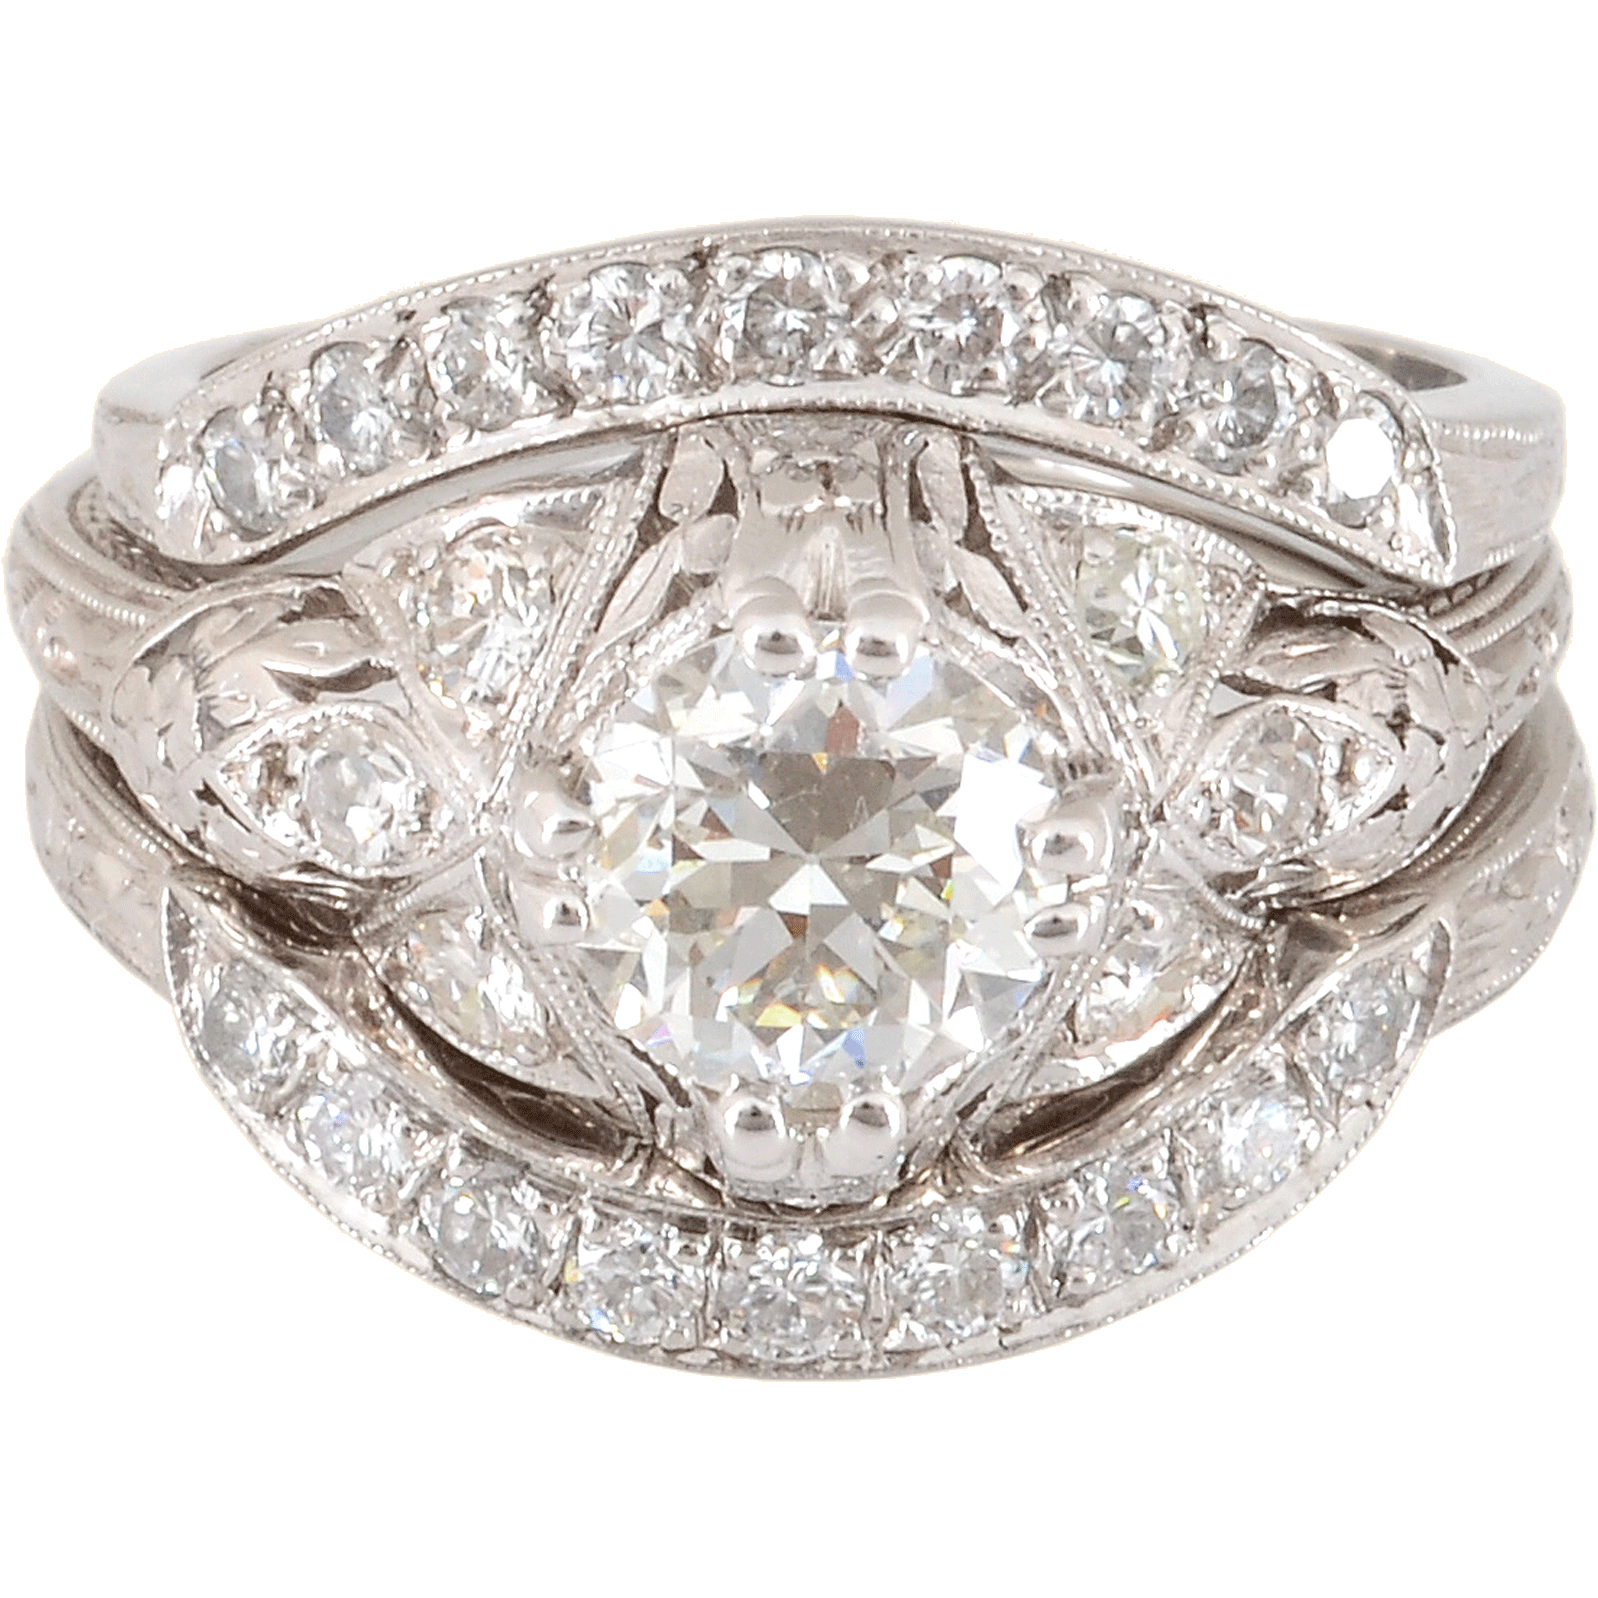 Platinum Three Piece Wedding Set with a 1.05 Carat Center Diamond